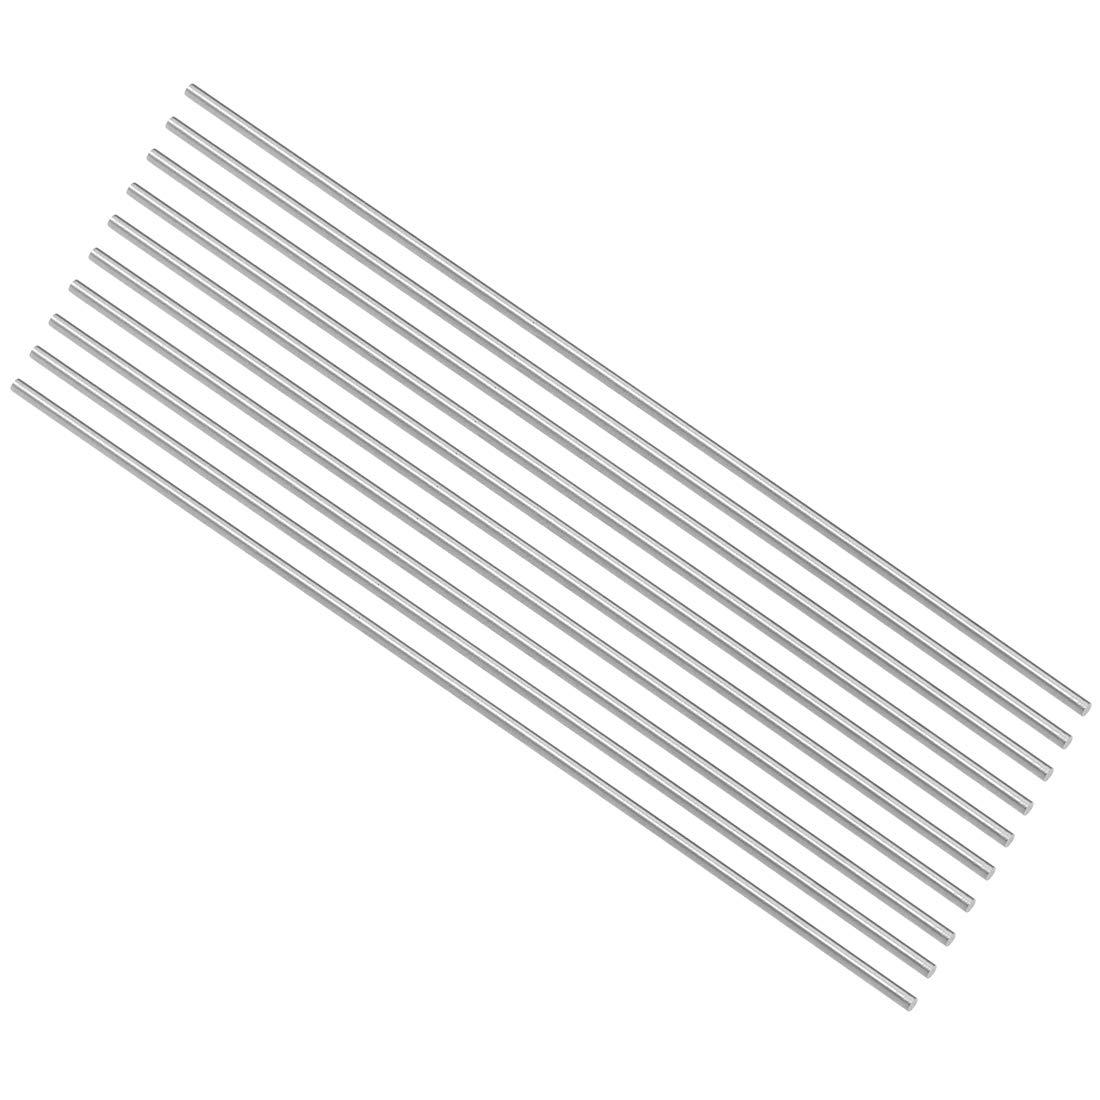 20 Pcs for Shaft Miniature Axle DIY Craft Tool sourcing map Round Rod 1.3mm Diameter 100mm Length HSS Lathe Bar Stock